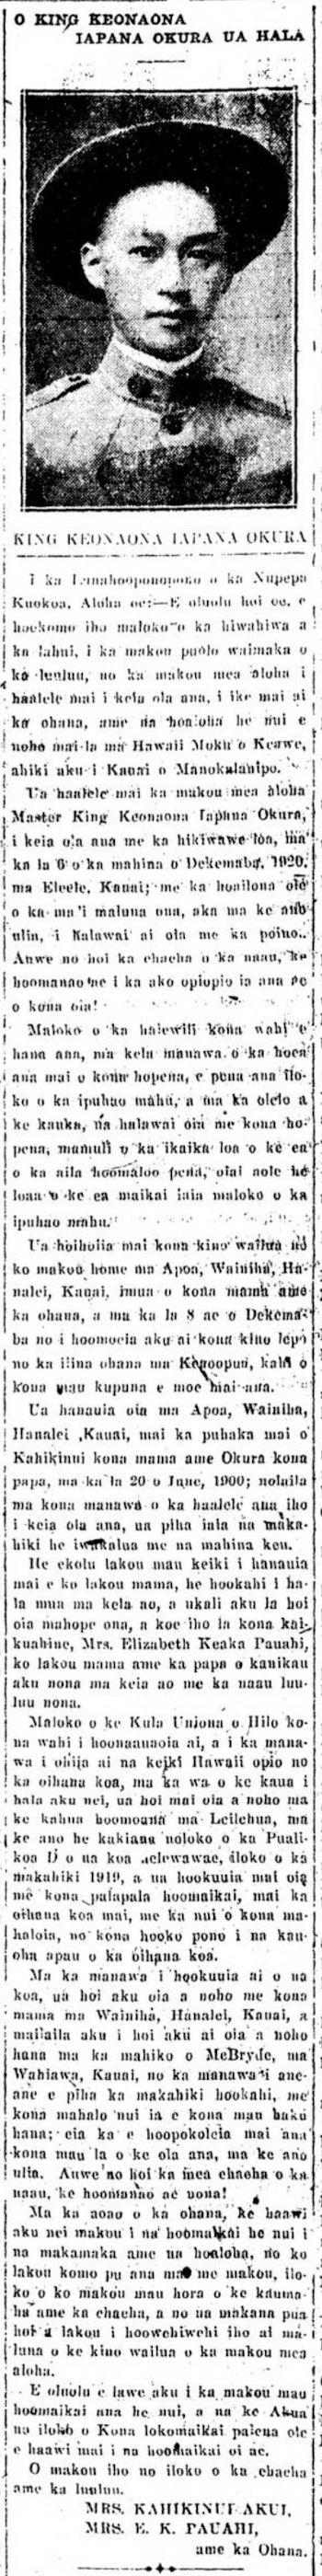 Kuokoa_2_11_1921_2